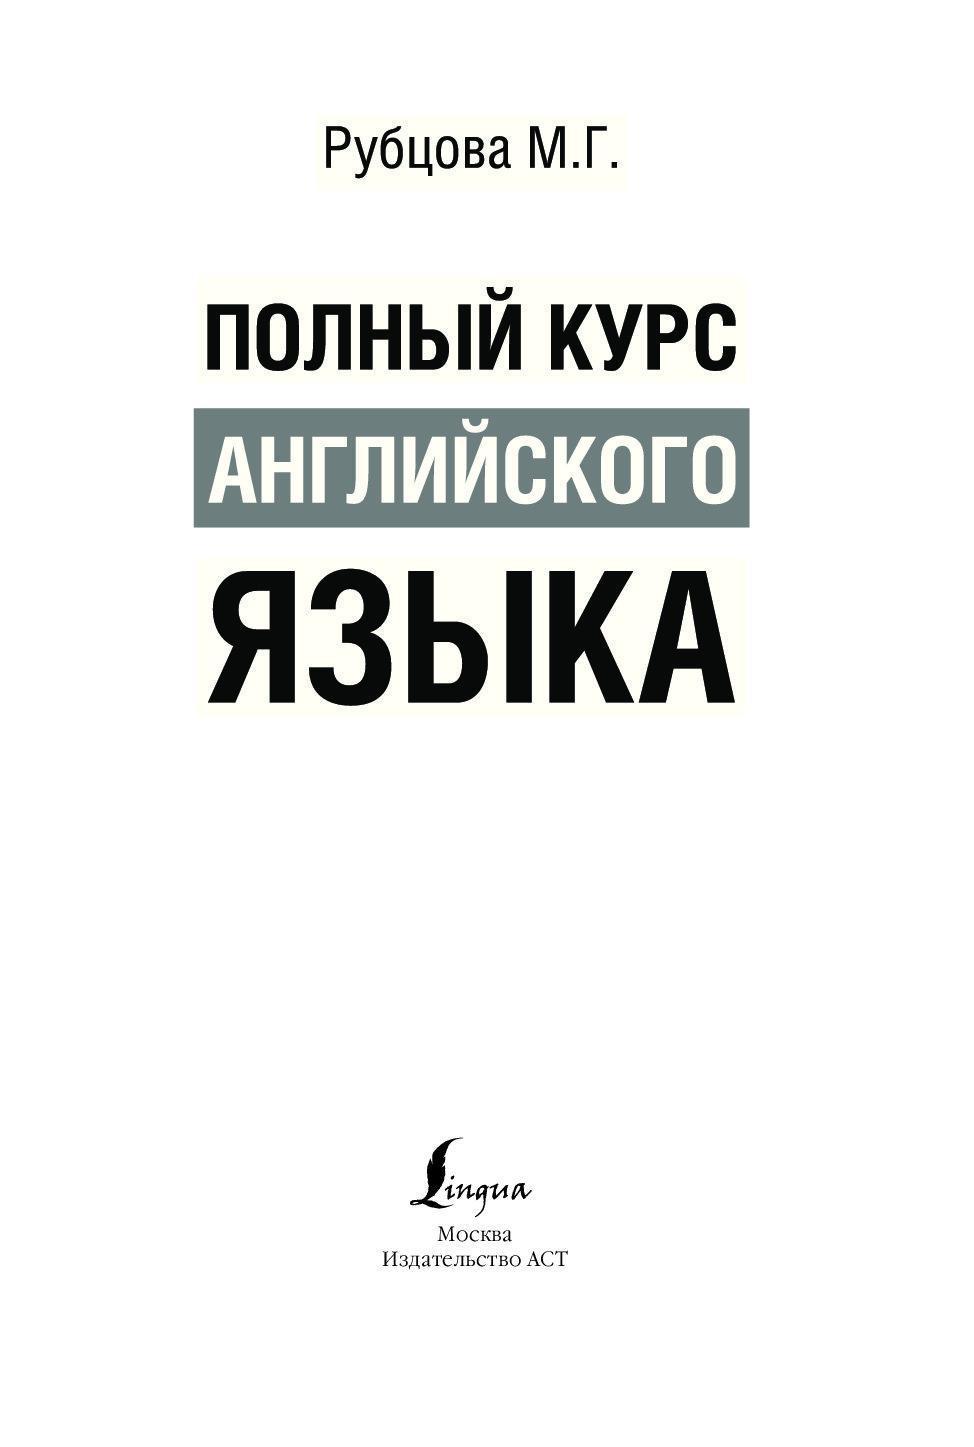 Решебник Рубцова М.г